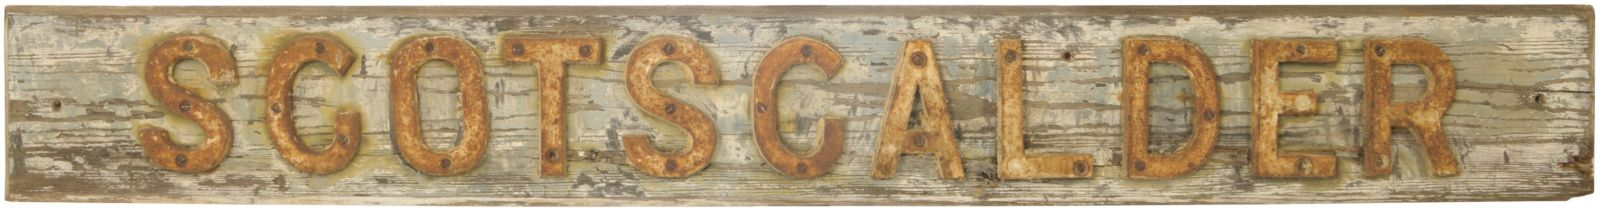 Lot 31 - Railway Signal Box Nameboards, Scotscalder: A signal box name board, SCOTSCALDER, from a remote